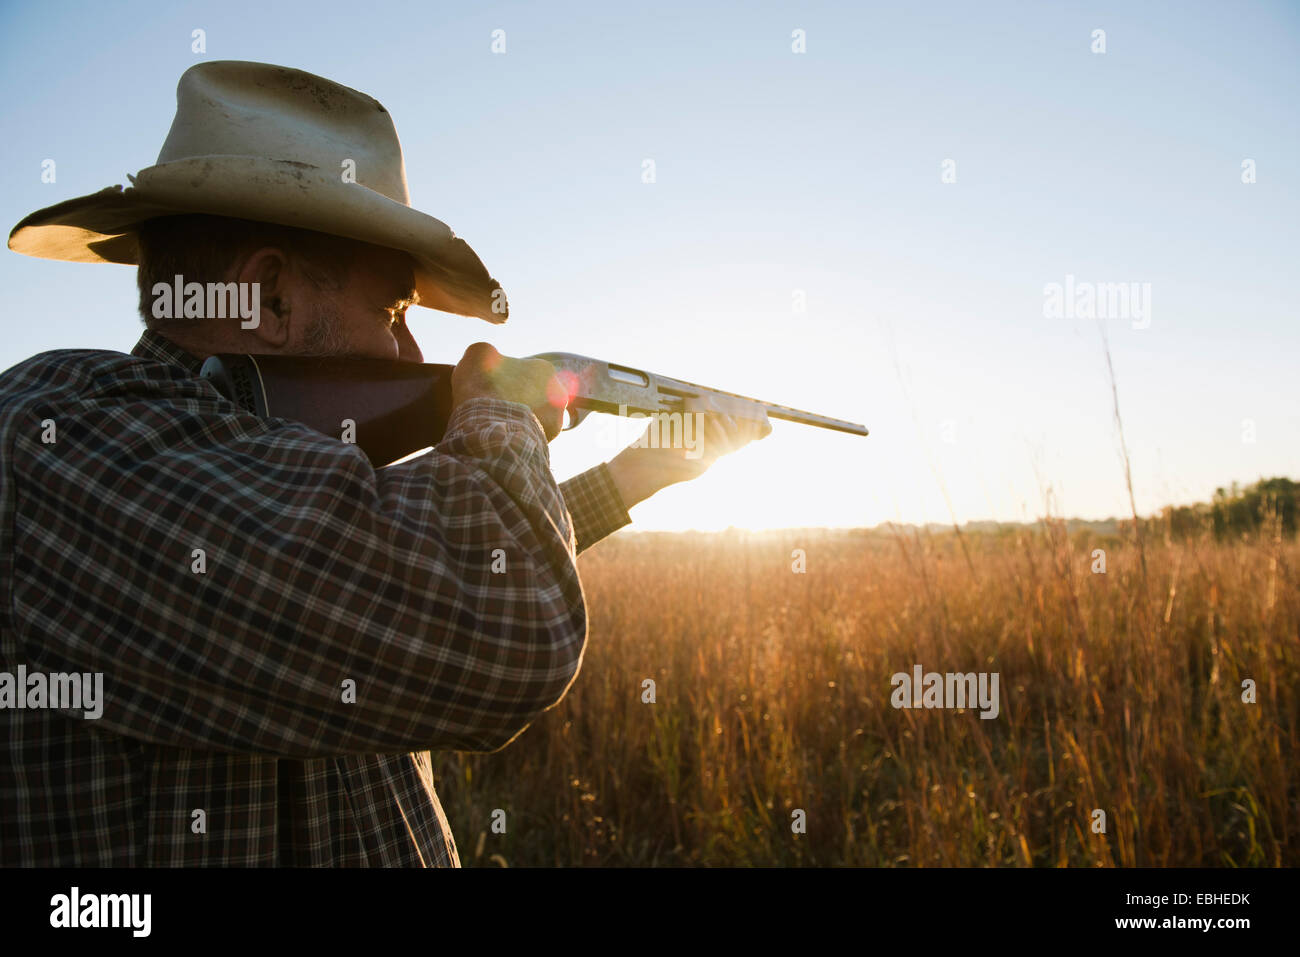 Senior male farmer aiming shotgun in remote field at dusk, Plattsburg, Missouri, USA - Stock Image